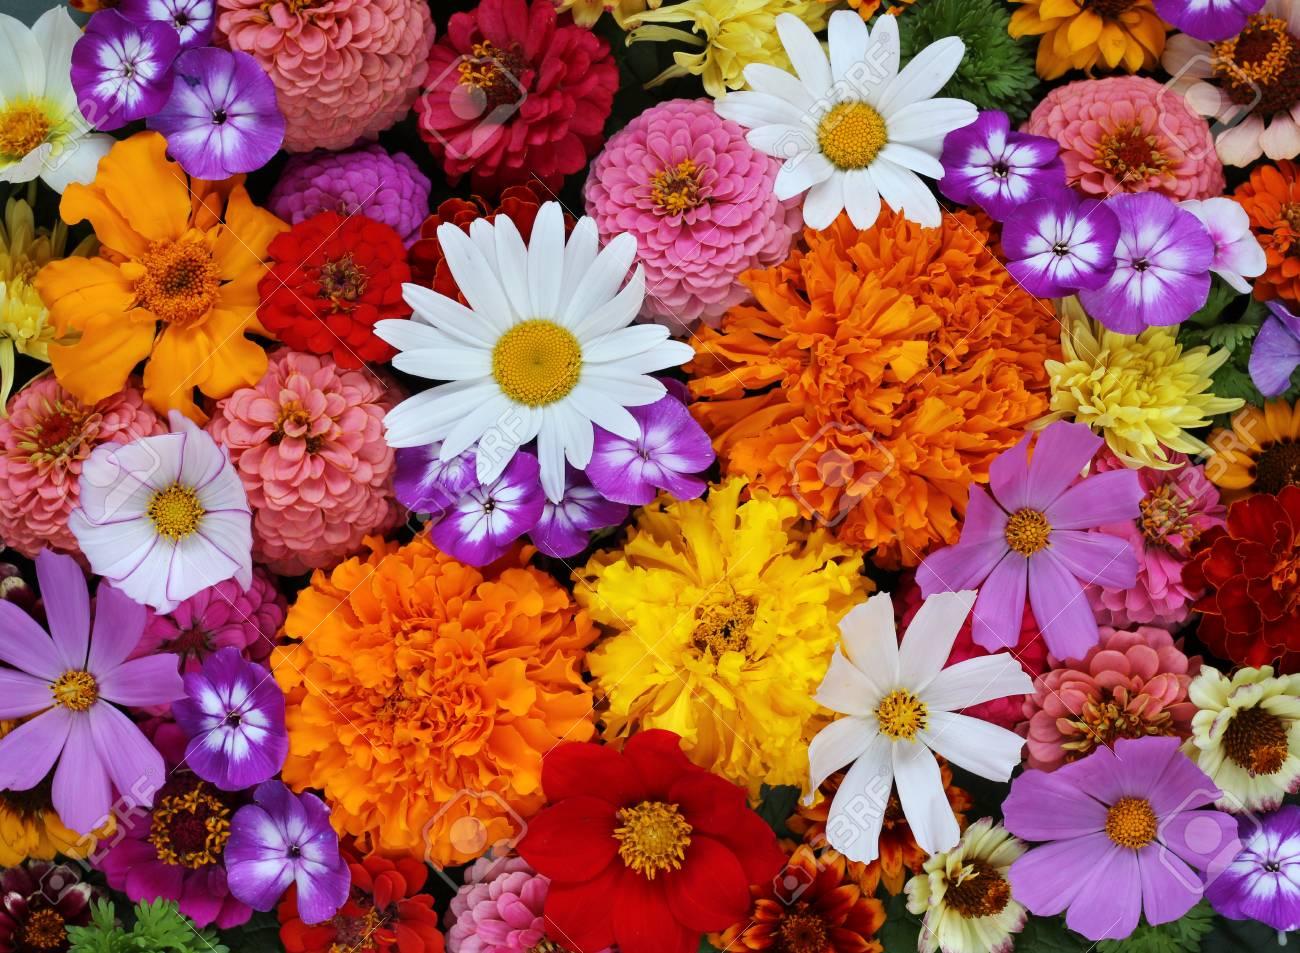 background of garden flowers, top view. Daisy, Phlox, dahlias..